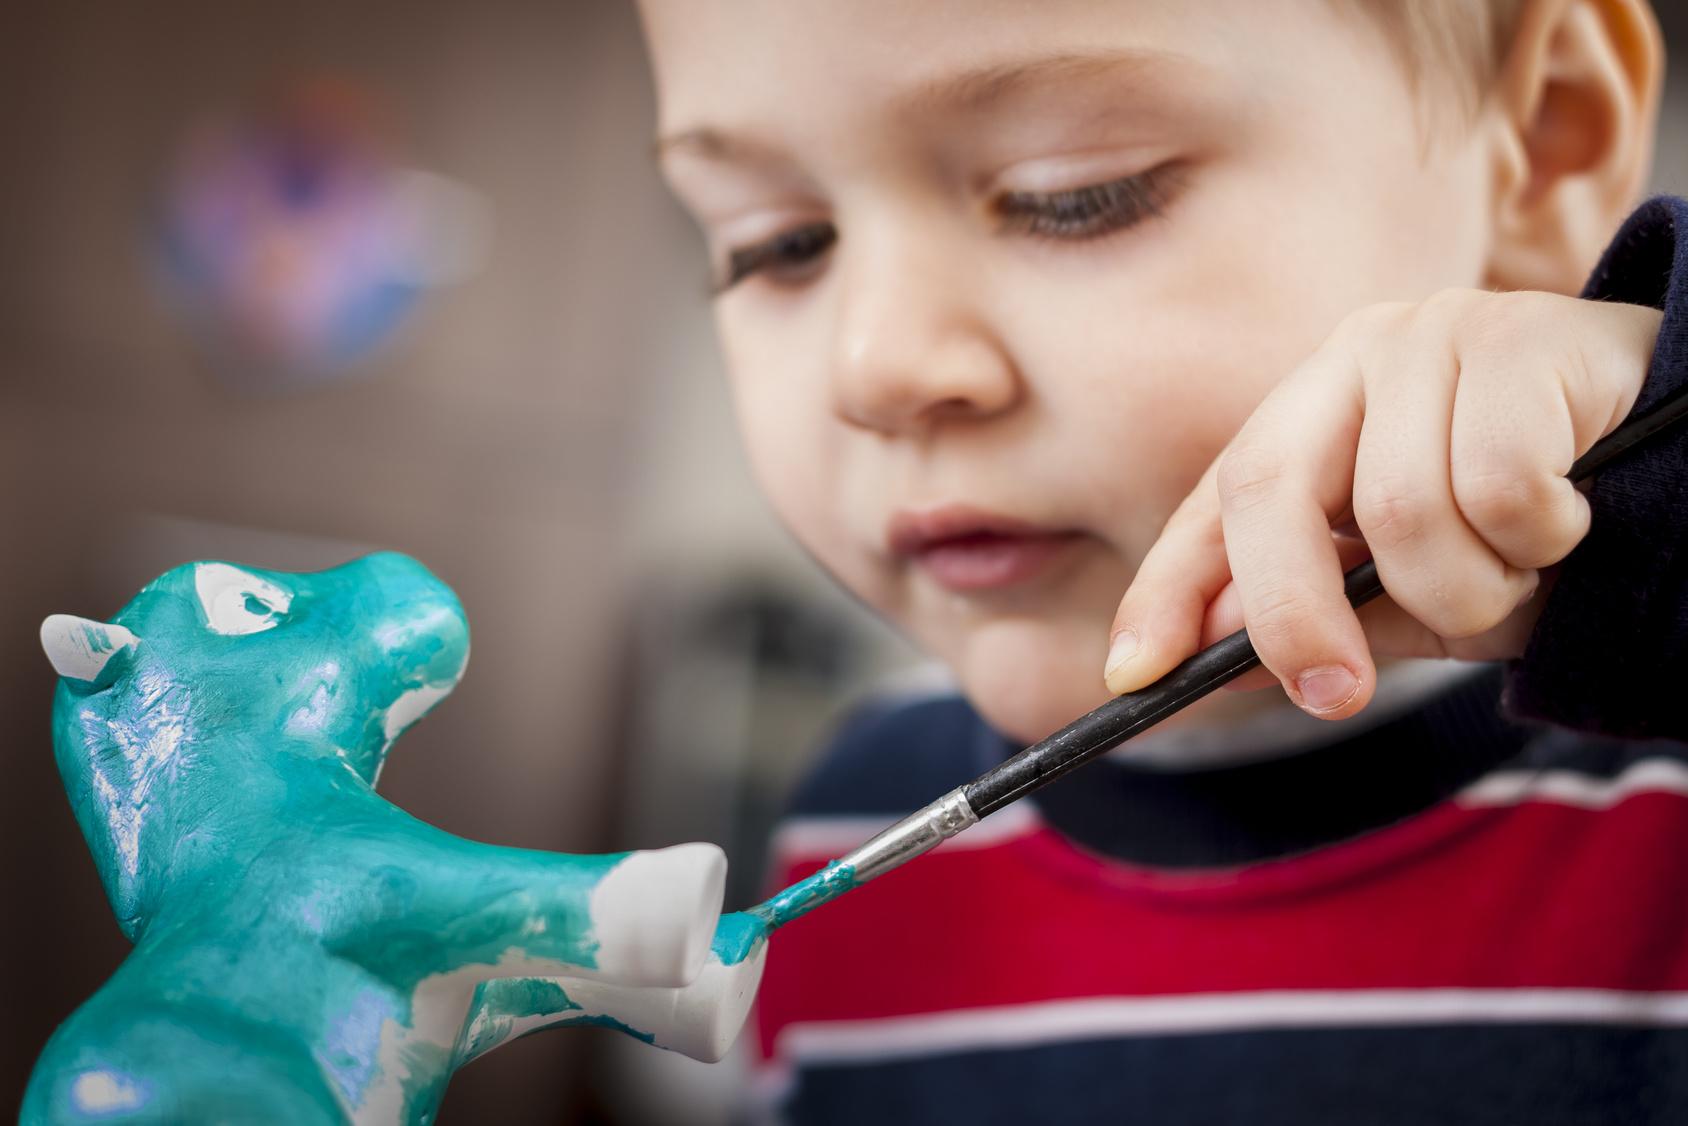 Detail of boy painting ceramic figure